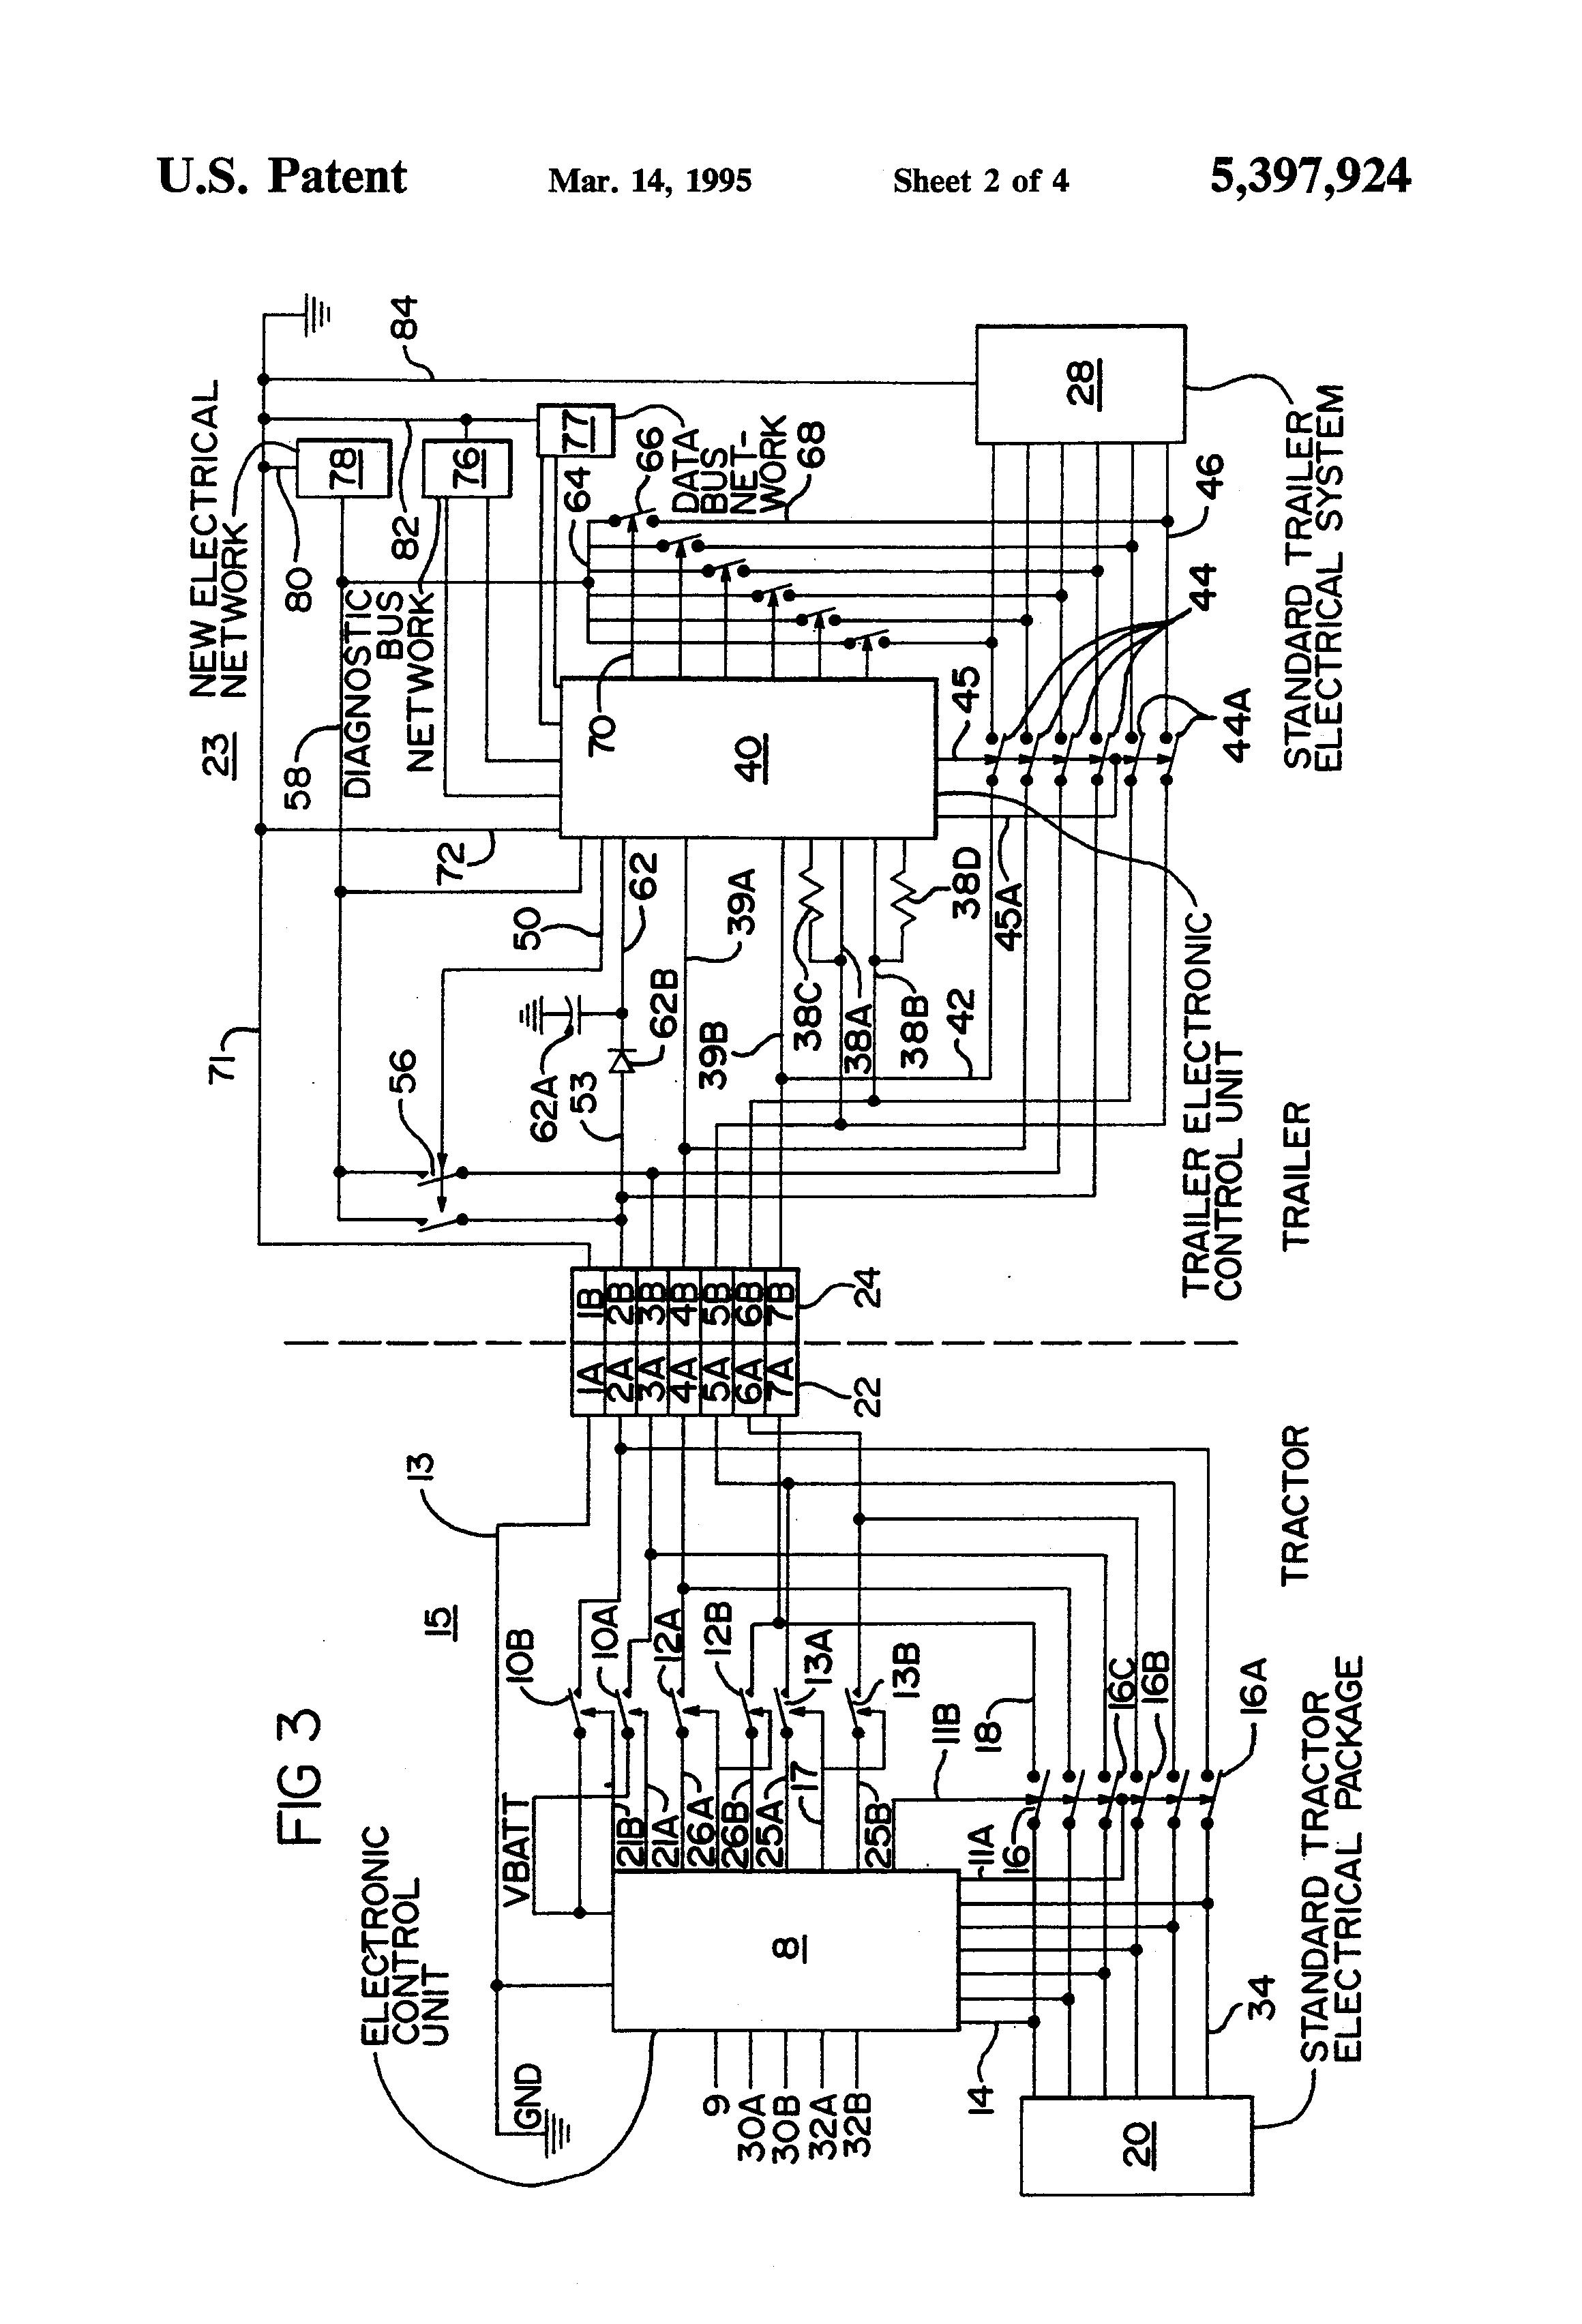 Wabco Abs Trailer Wiring Diagram - Honda Cl360 Wiring Diagram for Wiring  Diagram SchematicsWiring Diagram Schematics